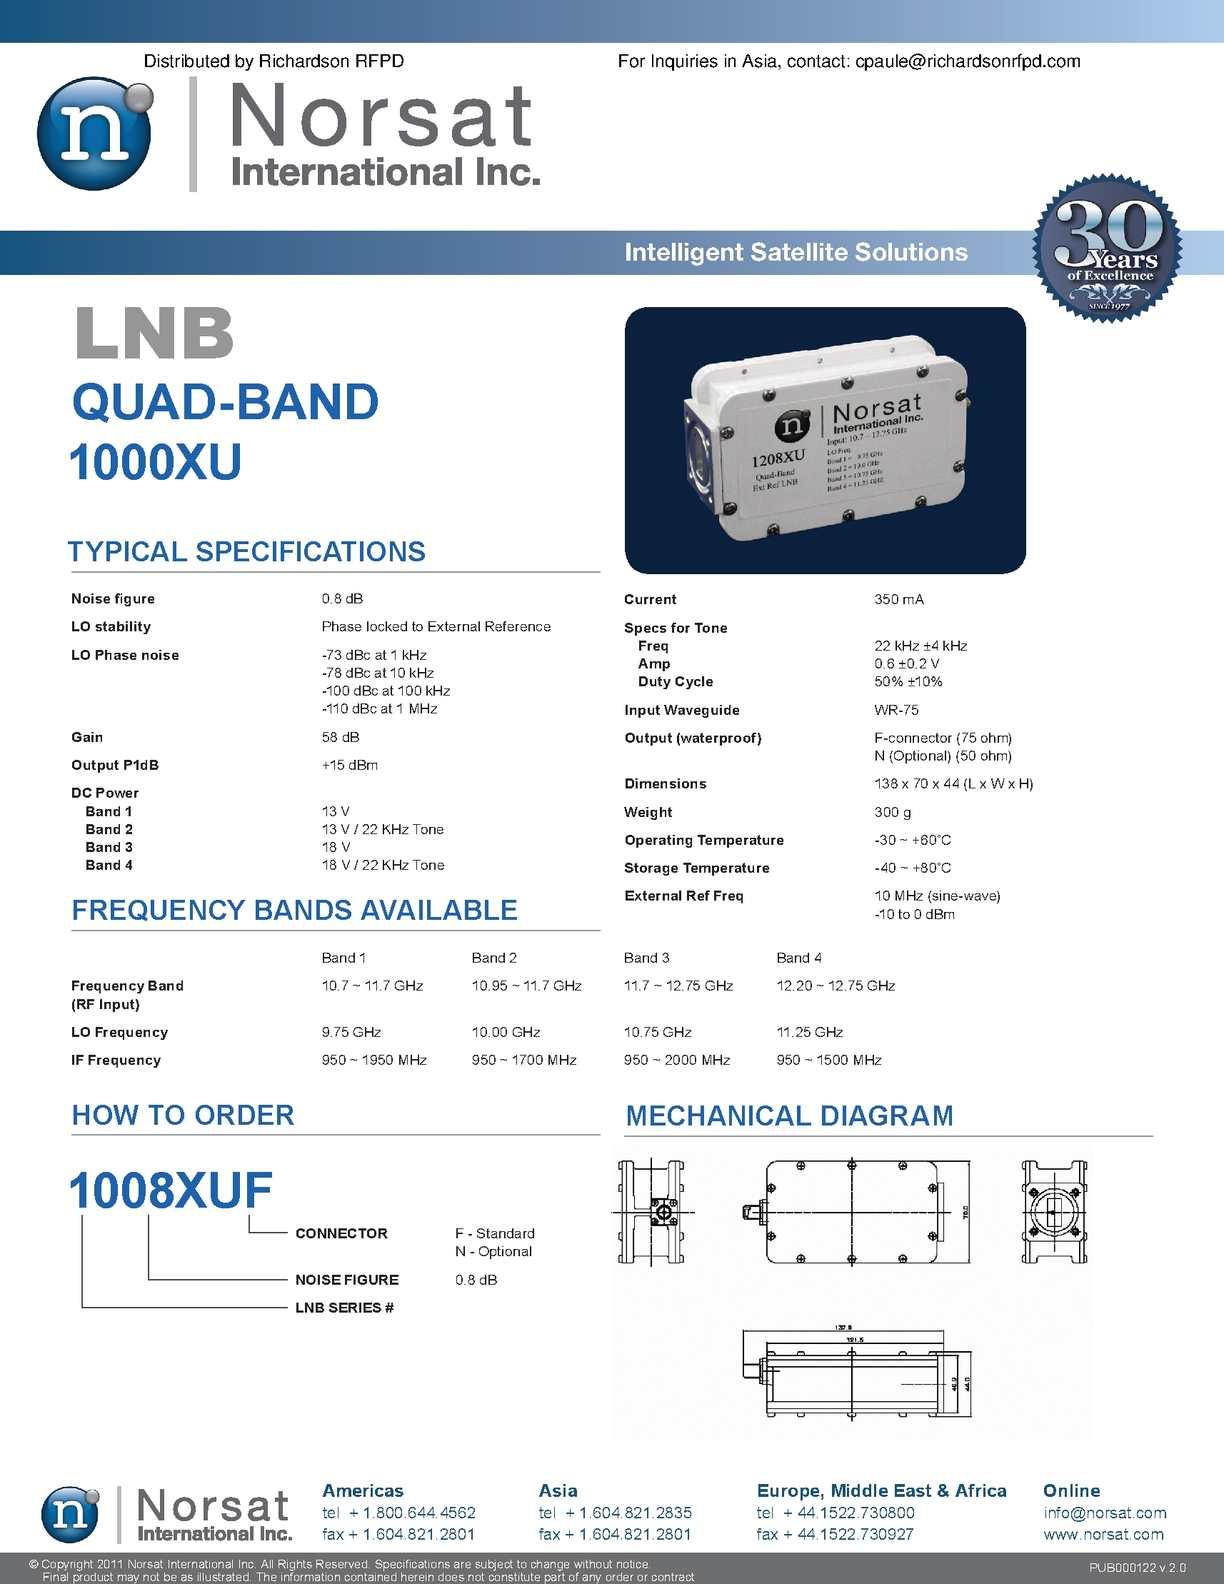 Calaméo - NORSAT_QUAD-BAND_1000XU_LNB